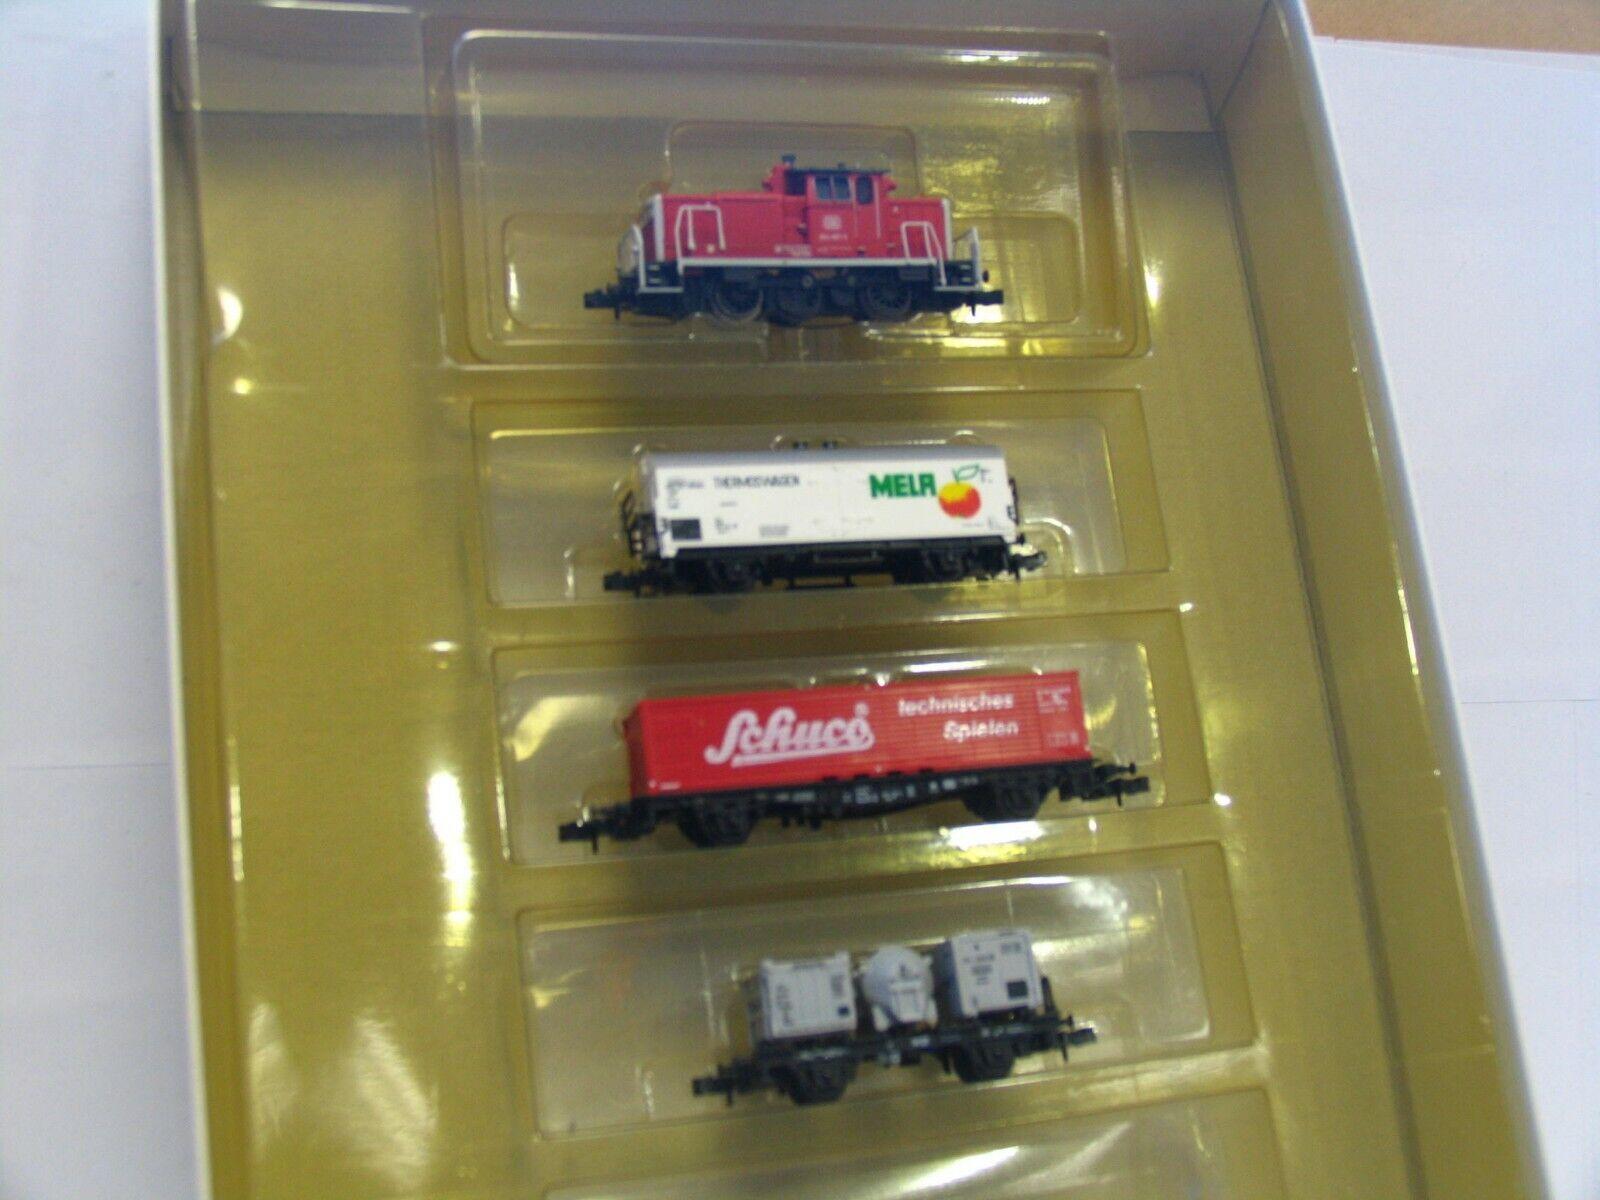 Ahorre hasta un 70% de descuento. Minitrix n 11002 4er set tren tren tren de Cochega con diesellok br 364 857-3 DB embalaje original (rb7604)  diseñador en linea